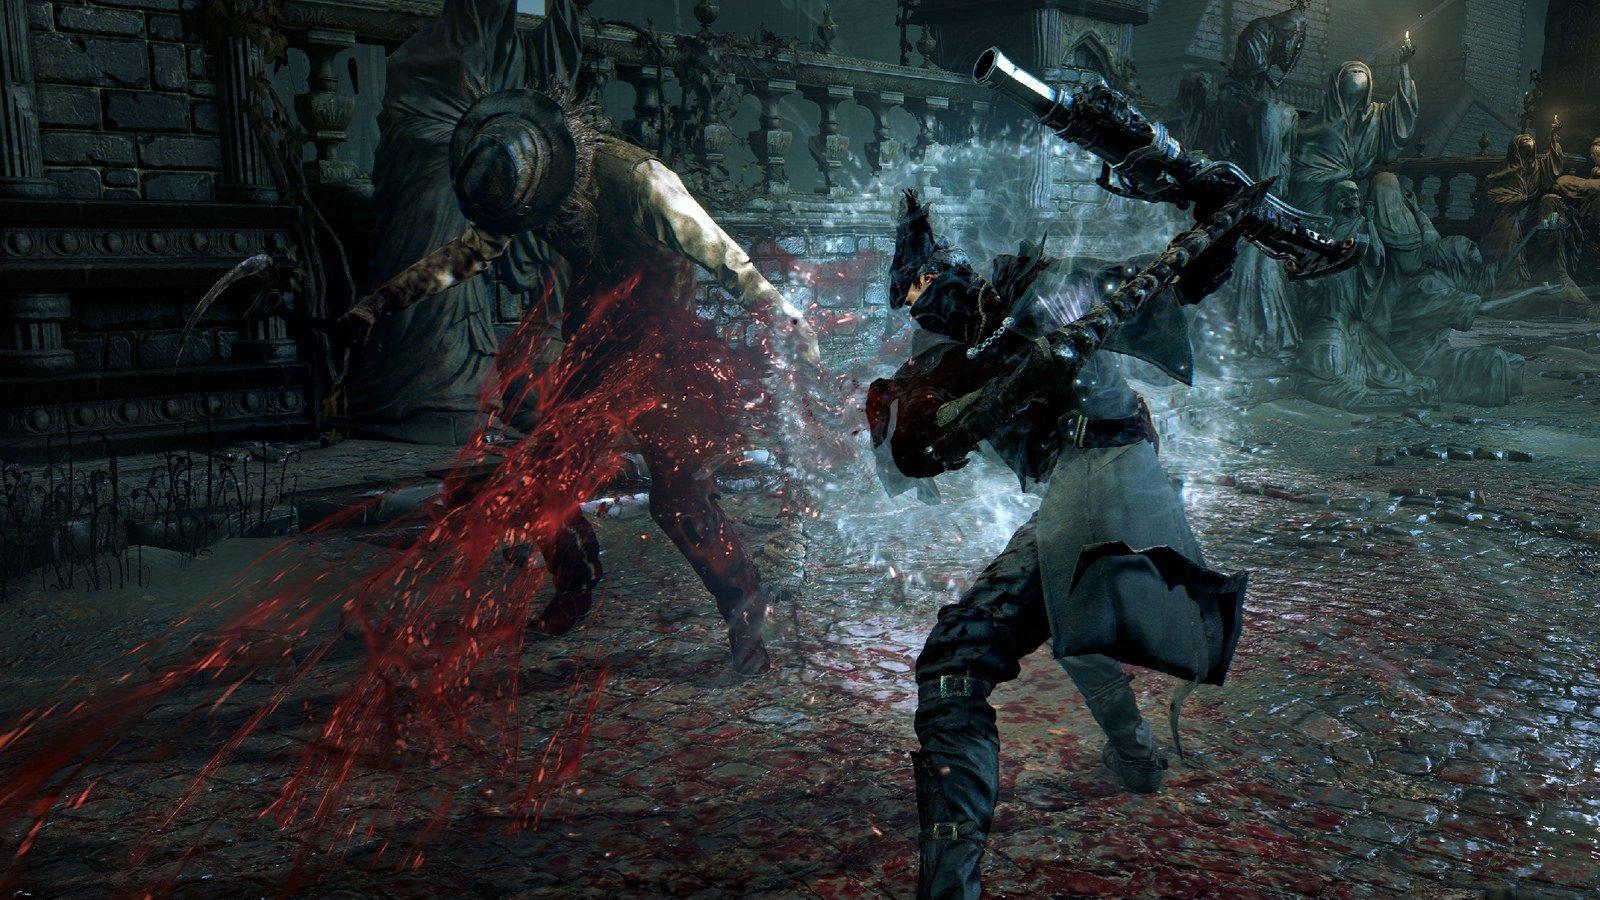 bloodborne-screenshot